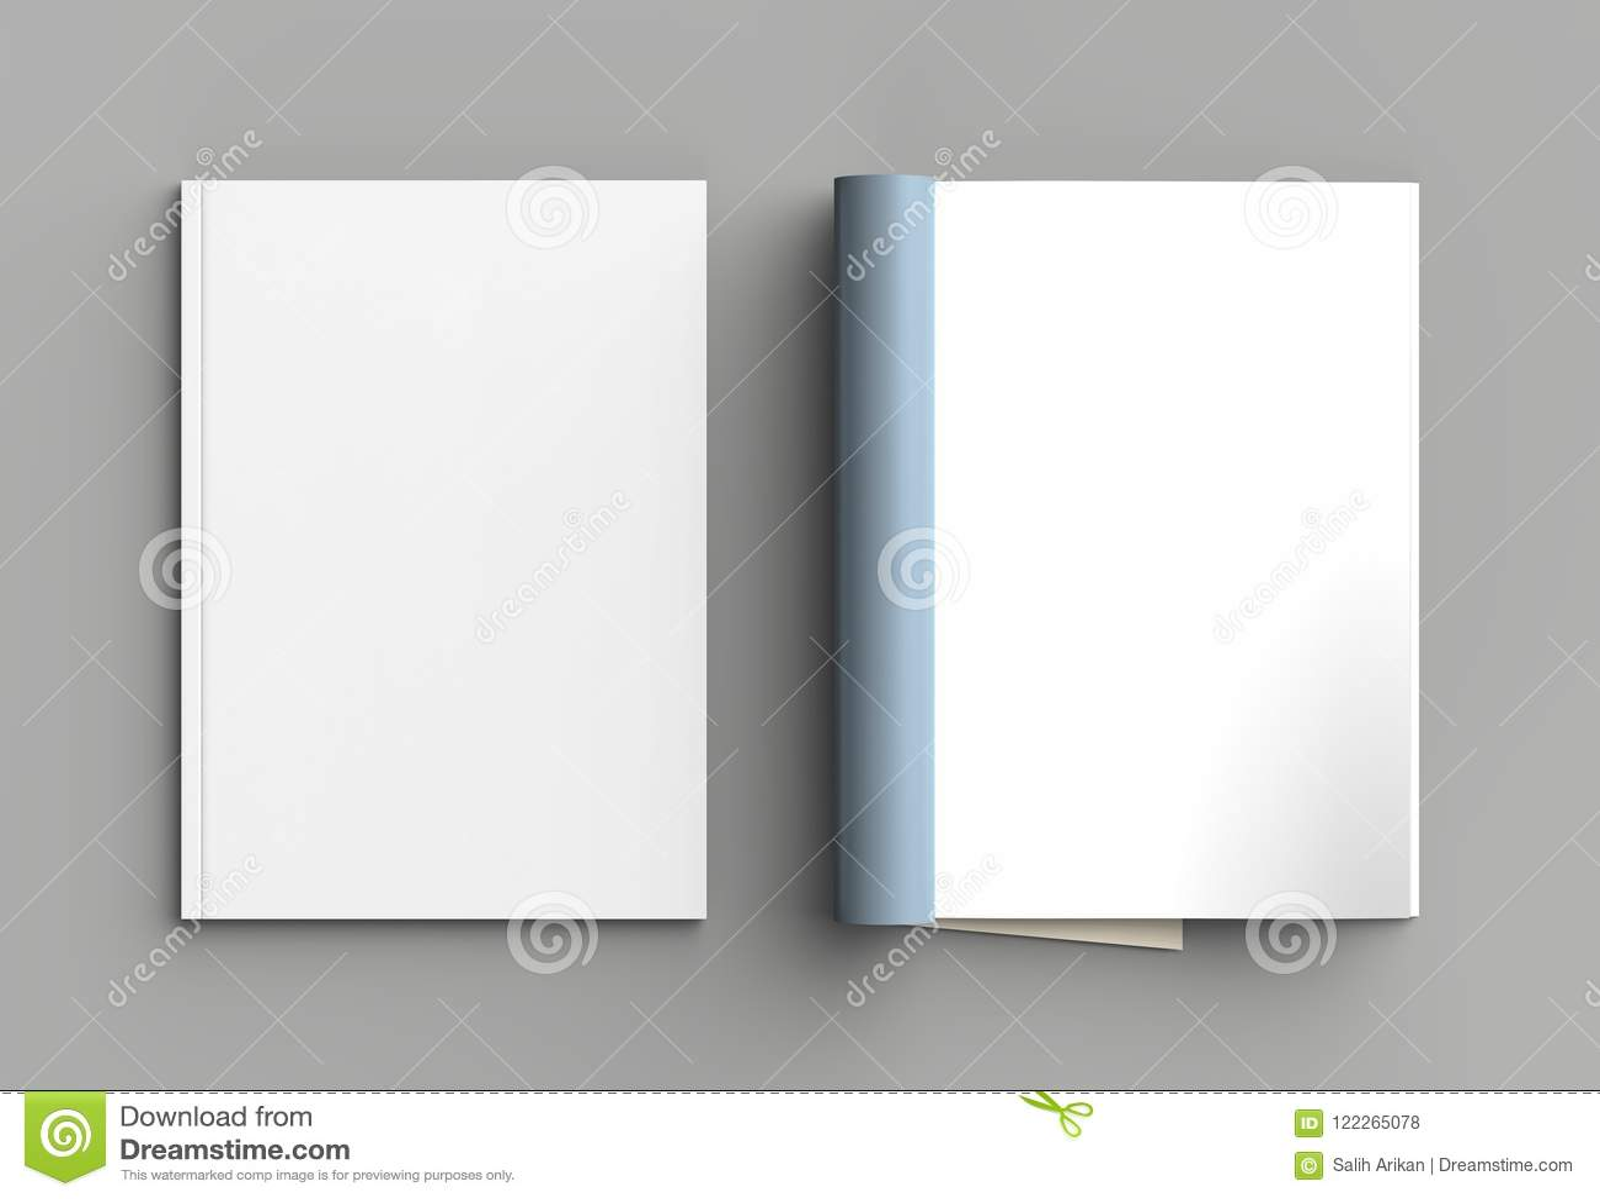 Magazine, brochure or catalog mock up isolated on gray background. 3d illustration